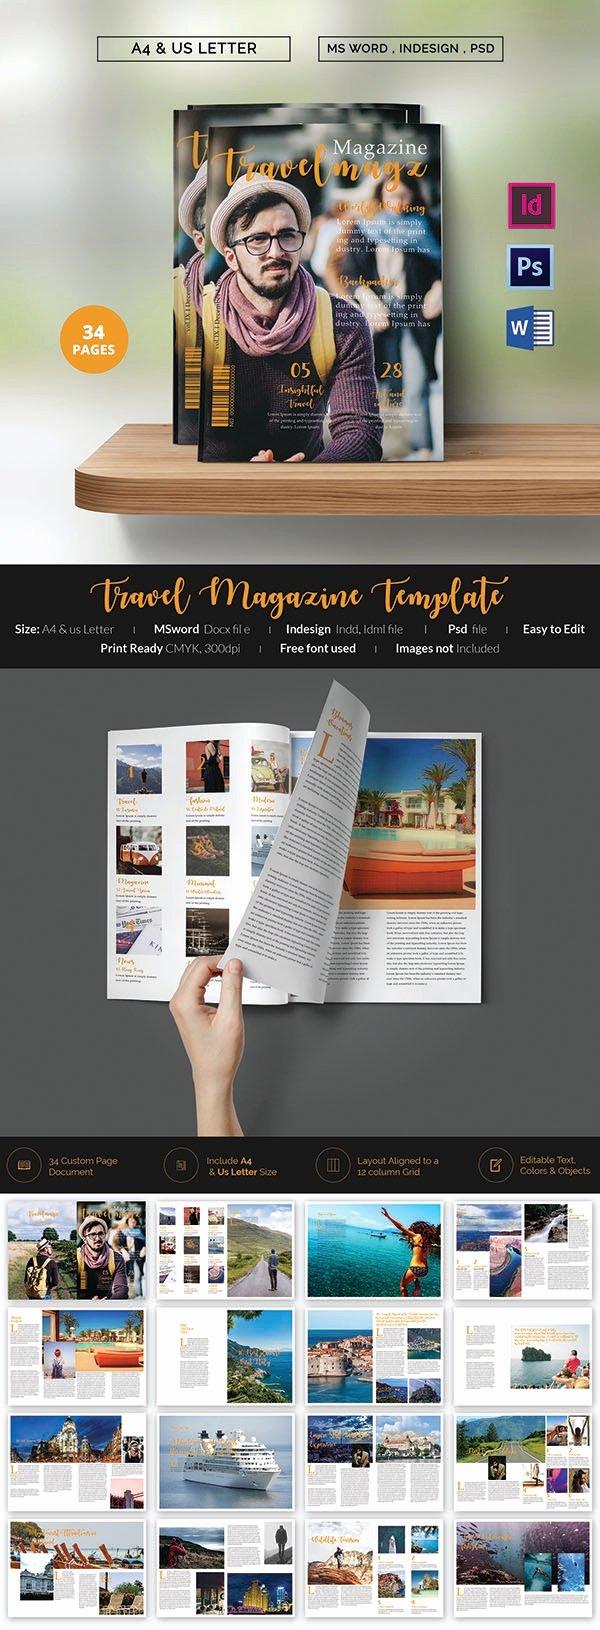 Magazine Template Free Word Luxury 55 Brand New Magazine Templates Free Word Psd Eps Ai